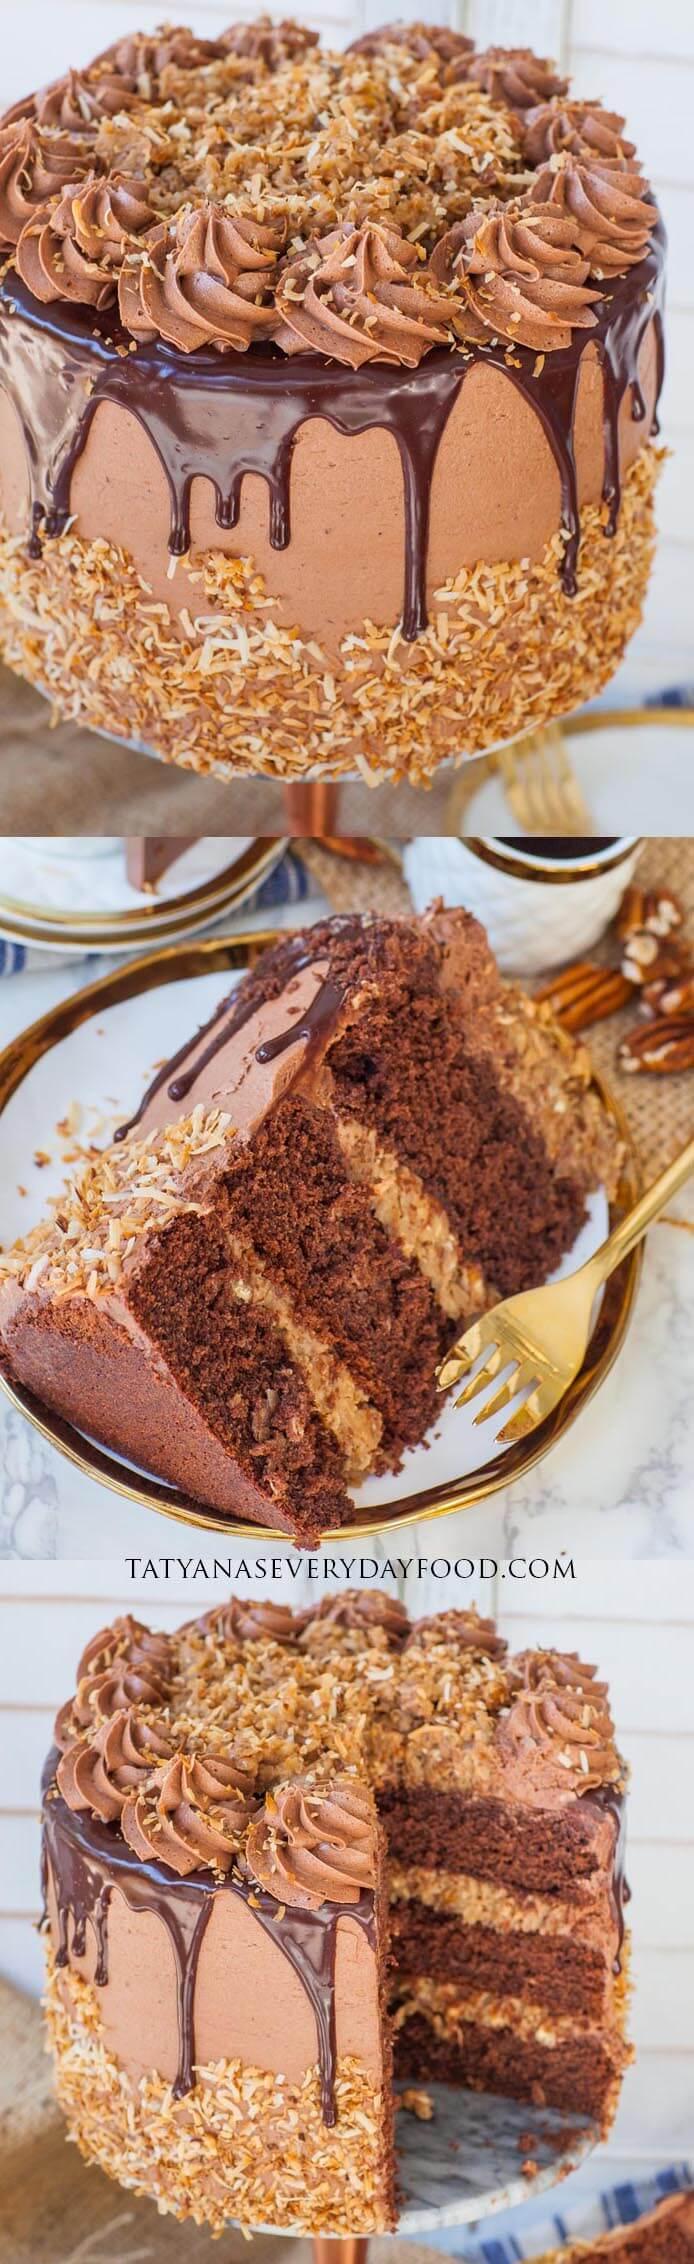 The BEST German Chocolate Cake video recipe